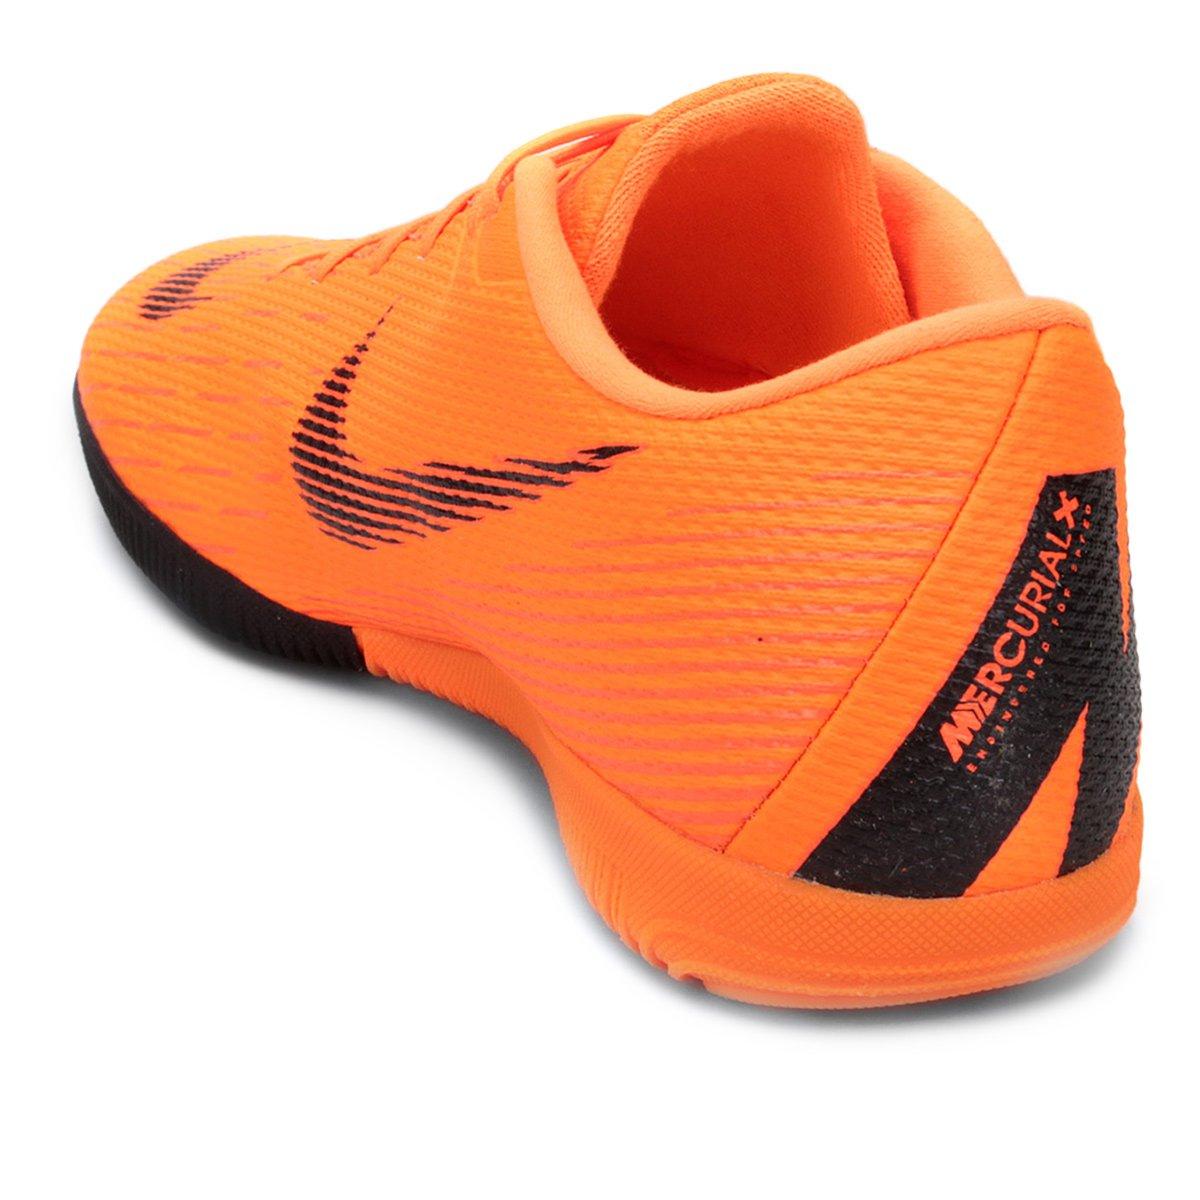 Chuteira Futsal Nike Mercurial Vapor 12 Academy - Laranja e Preto ... ad67a3b2b4bfe